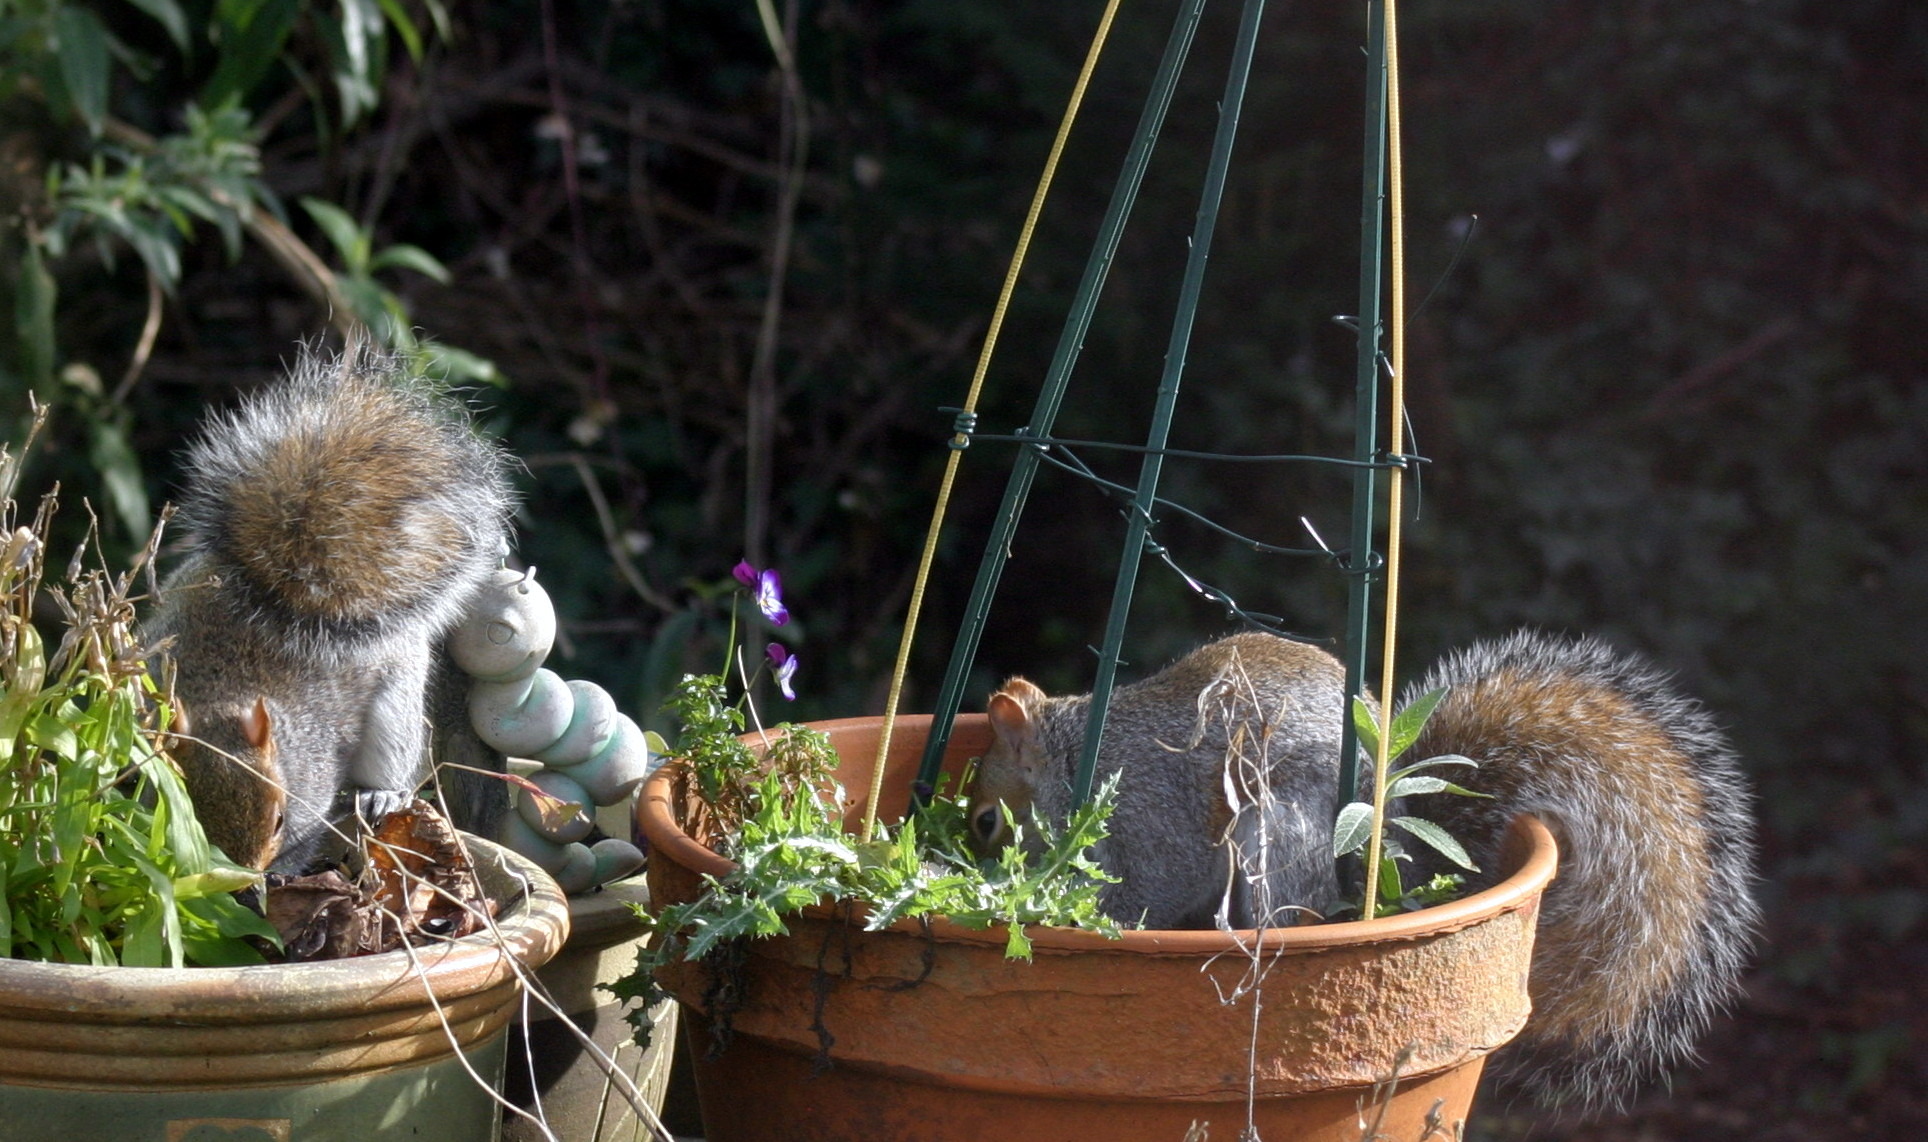 Squirrels - Doing a little gardening